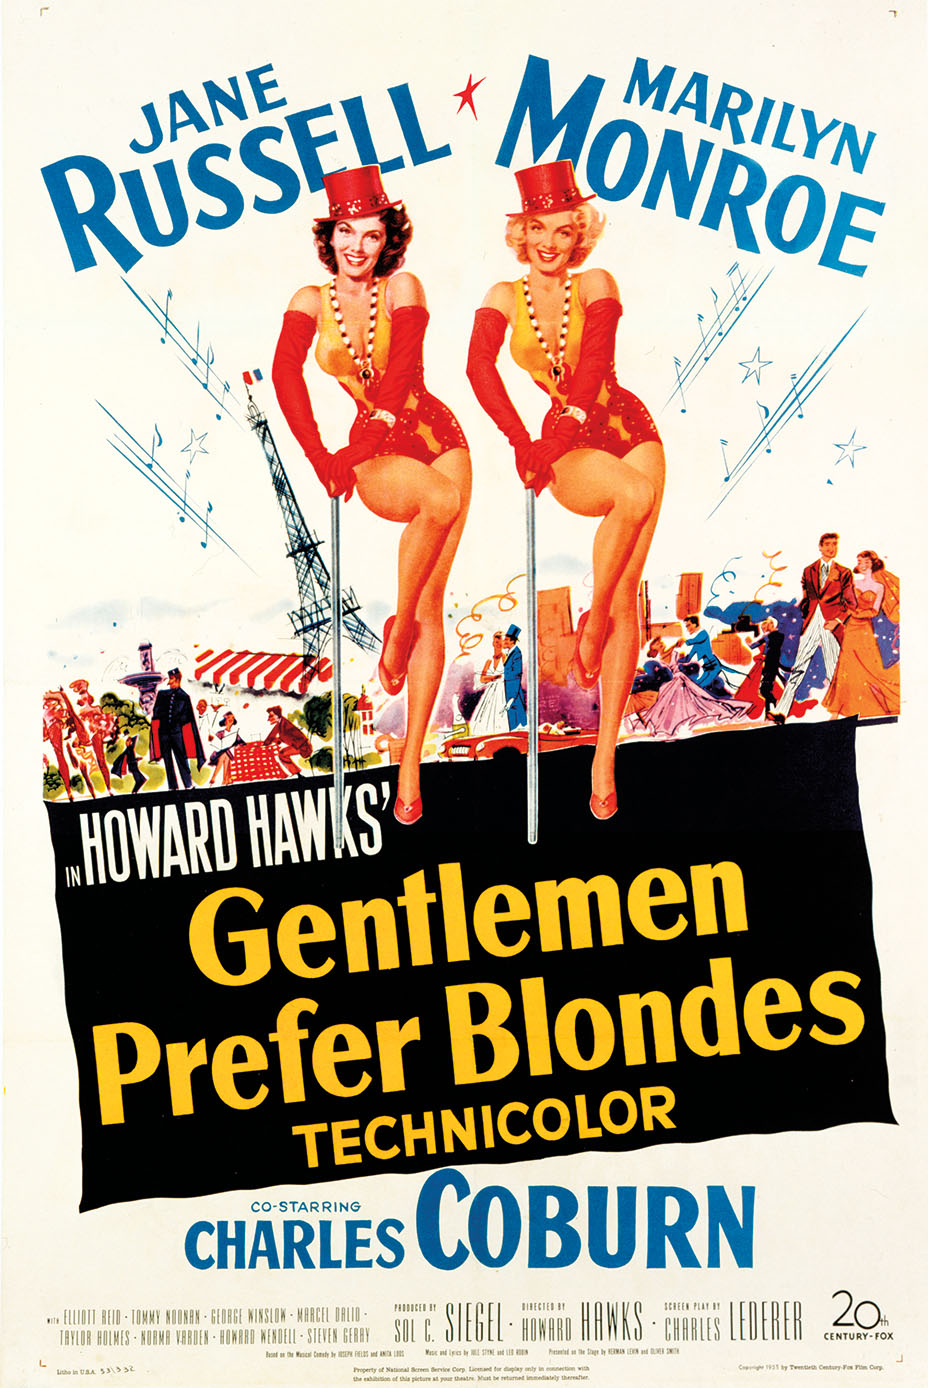 Gentlemen Prefer Blondes (1953) Technical Specifications